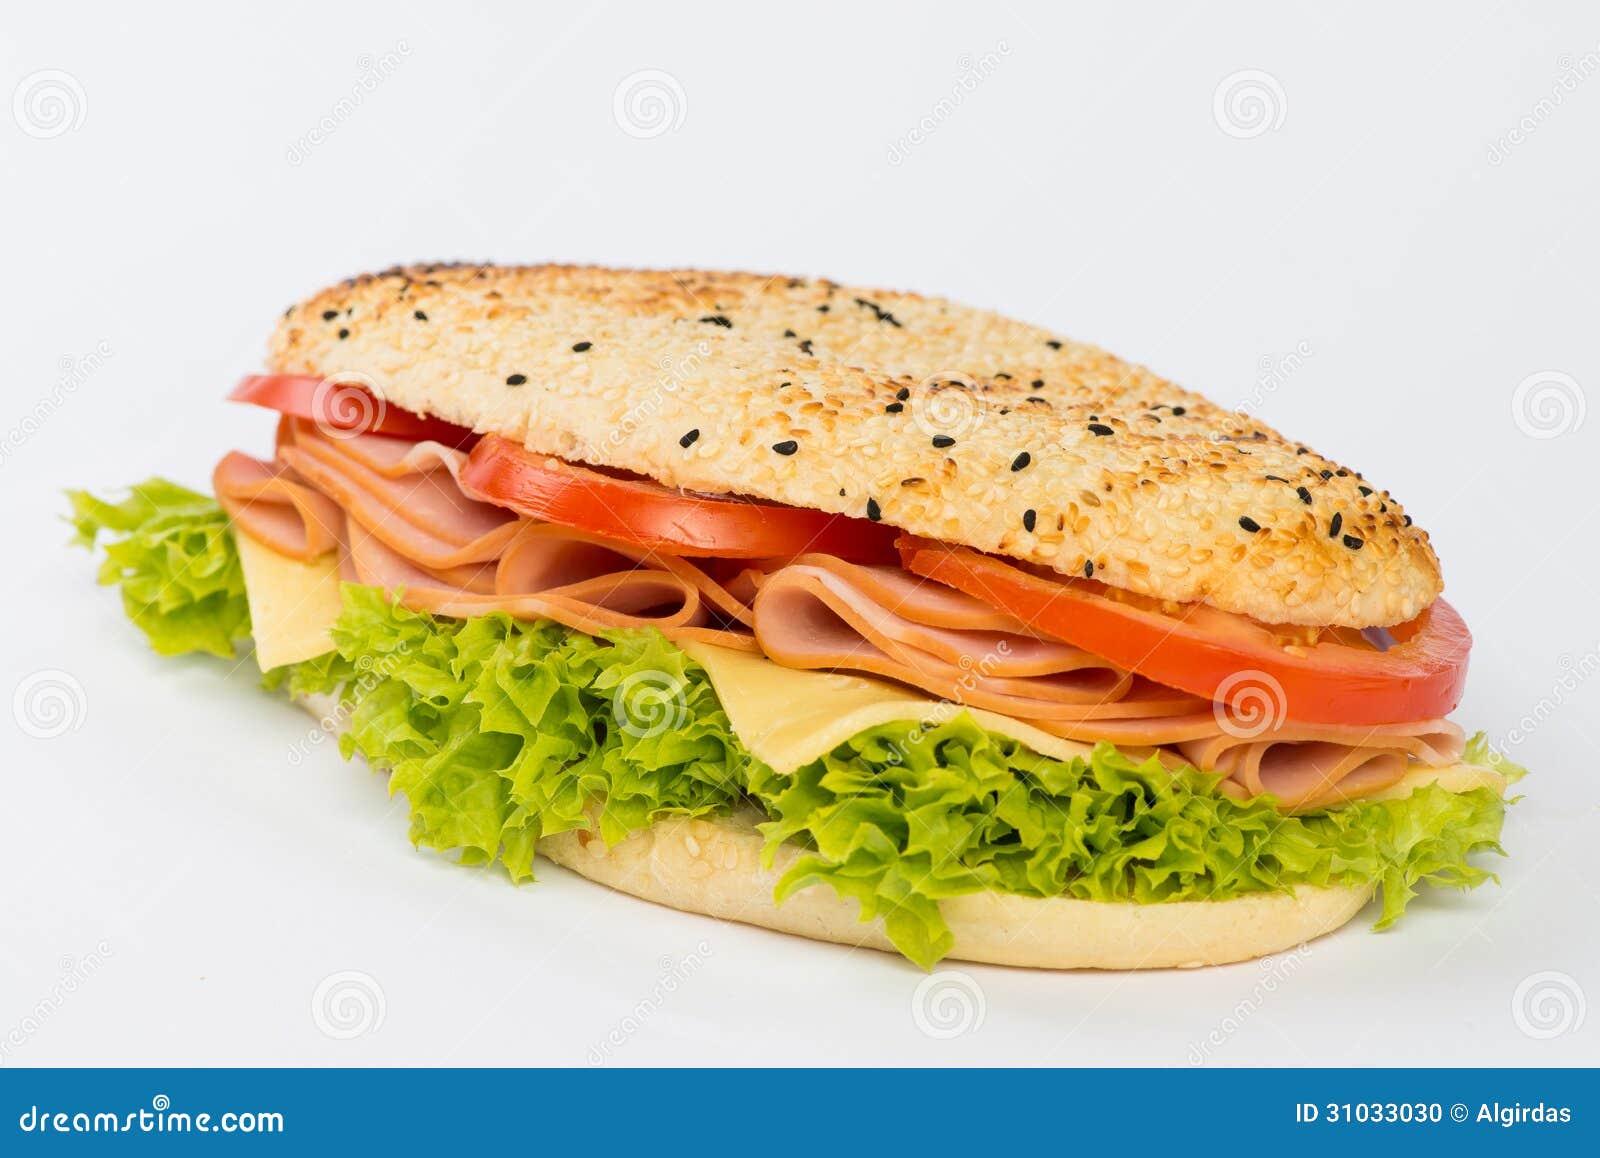 Ham And Cheese Sandwich Stock Photo - Image: 31033030